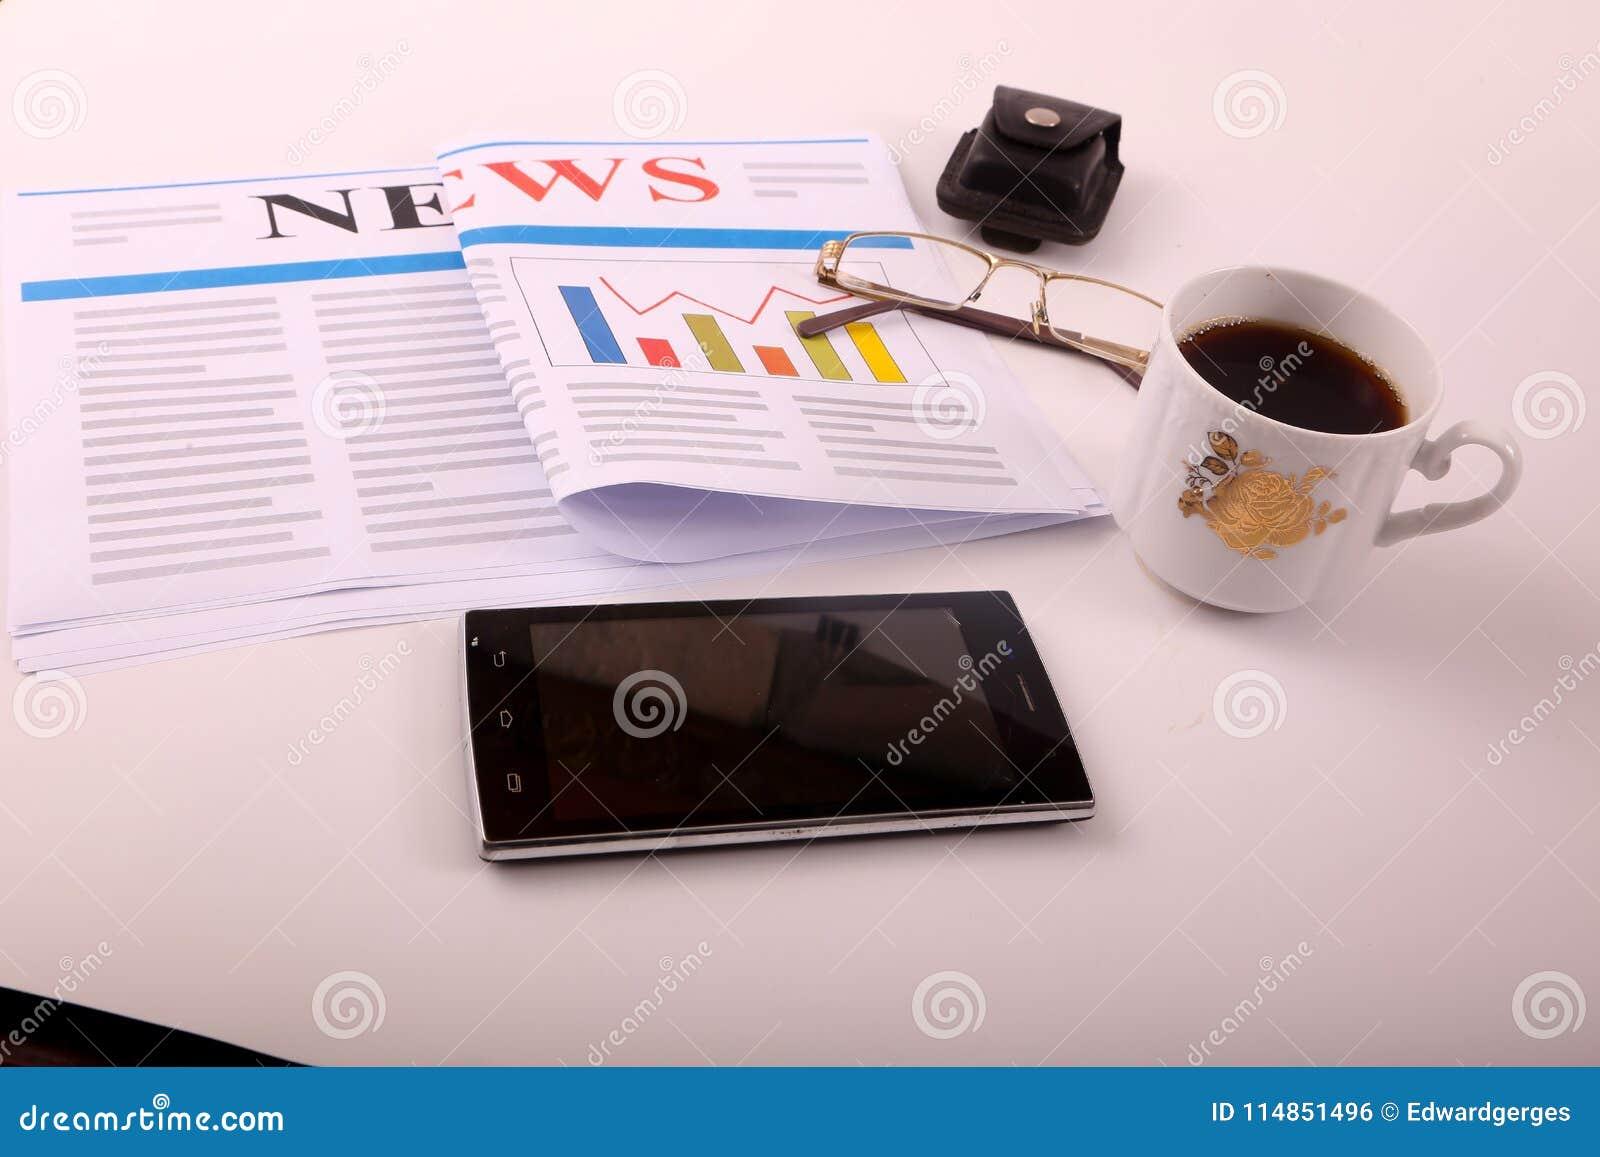 Smartphone mit Kaffee